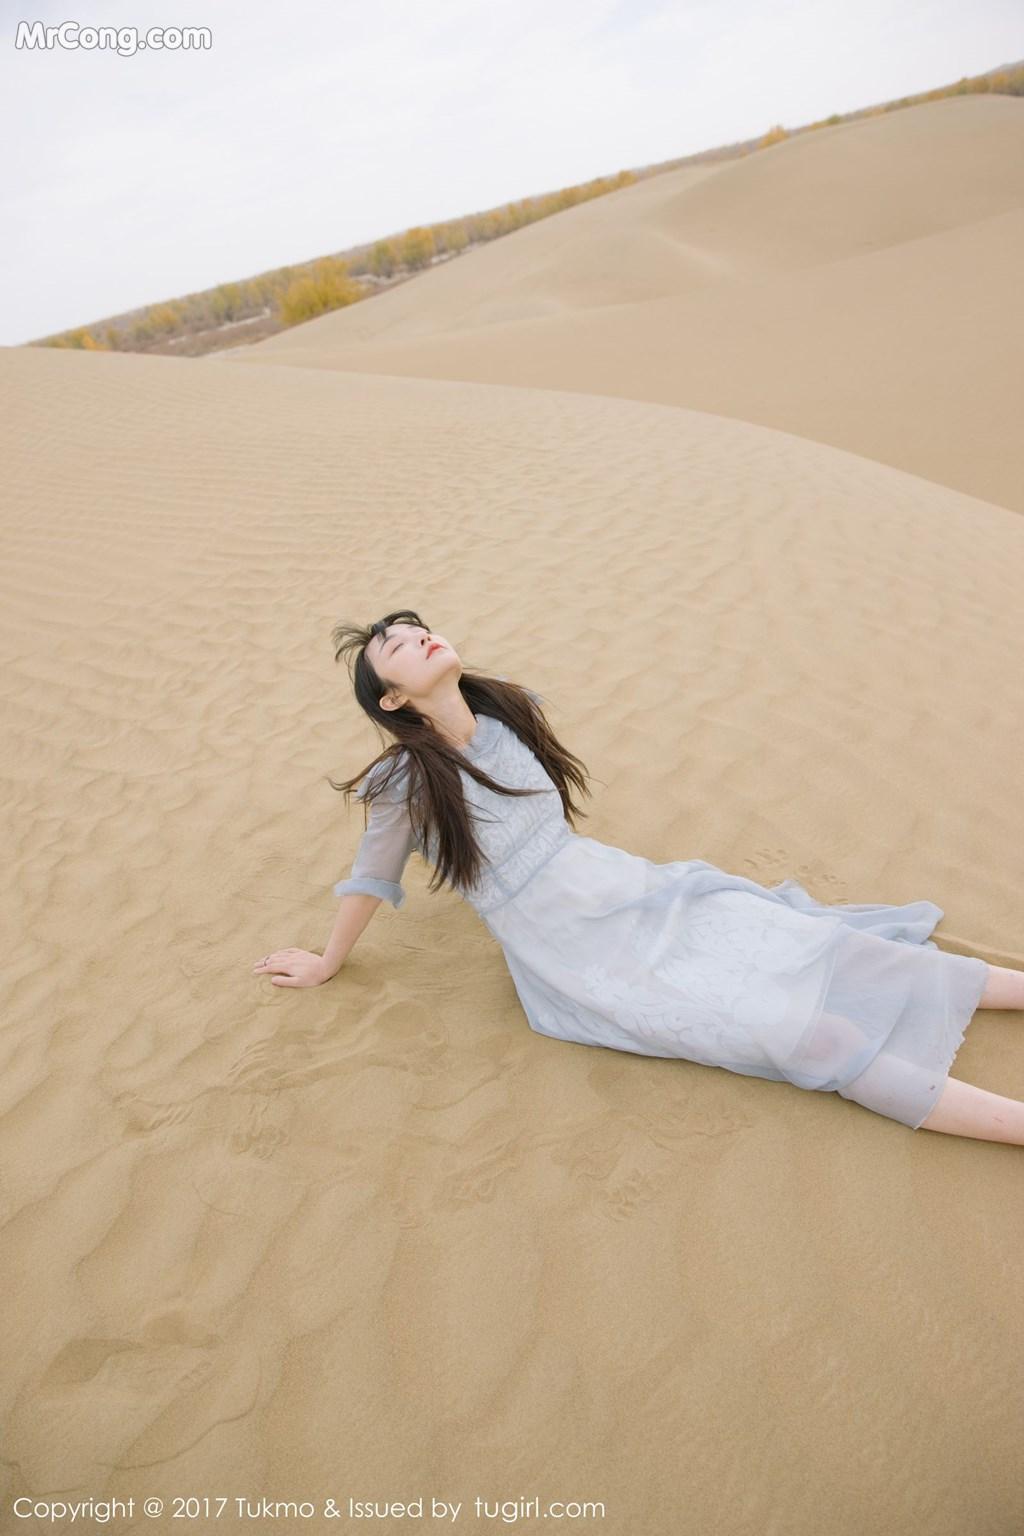 Image Tukmo-Vol.104-Zhi-Ying-MrCong.com-007 in post Tukmo Vol.104: Người mẫu Zhi Ying (之应) (41 ảnh)